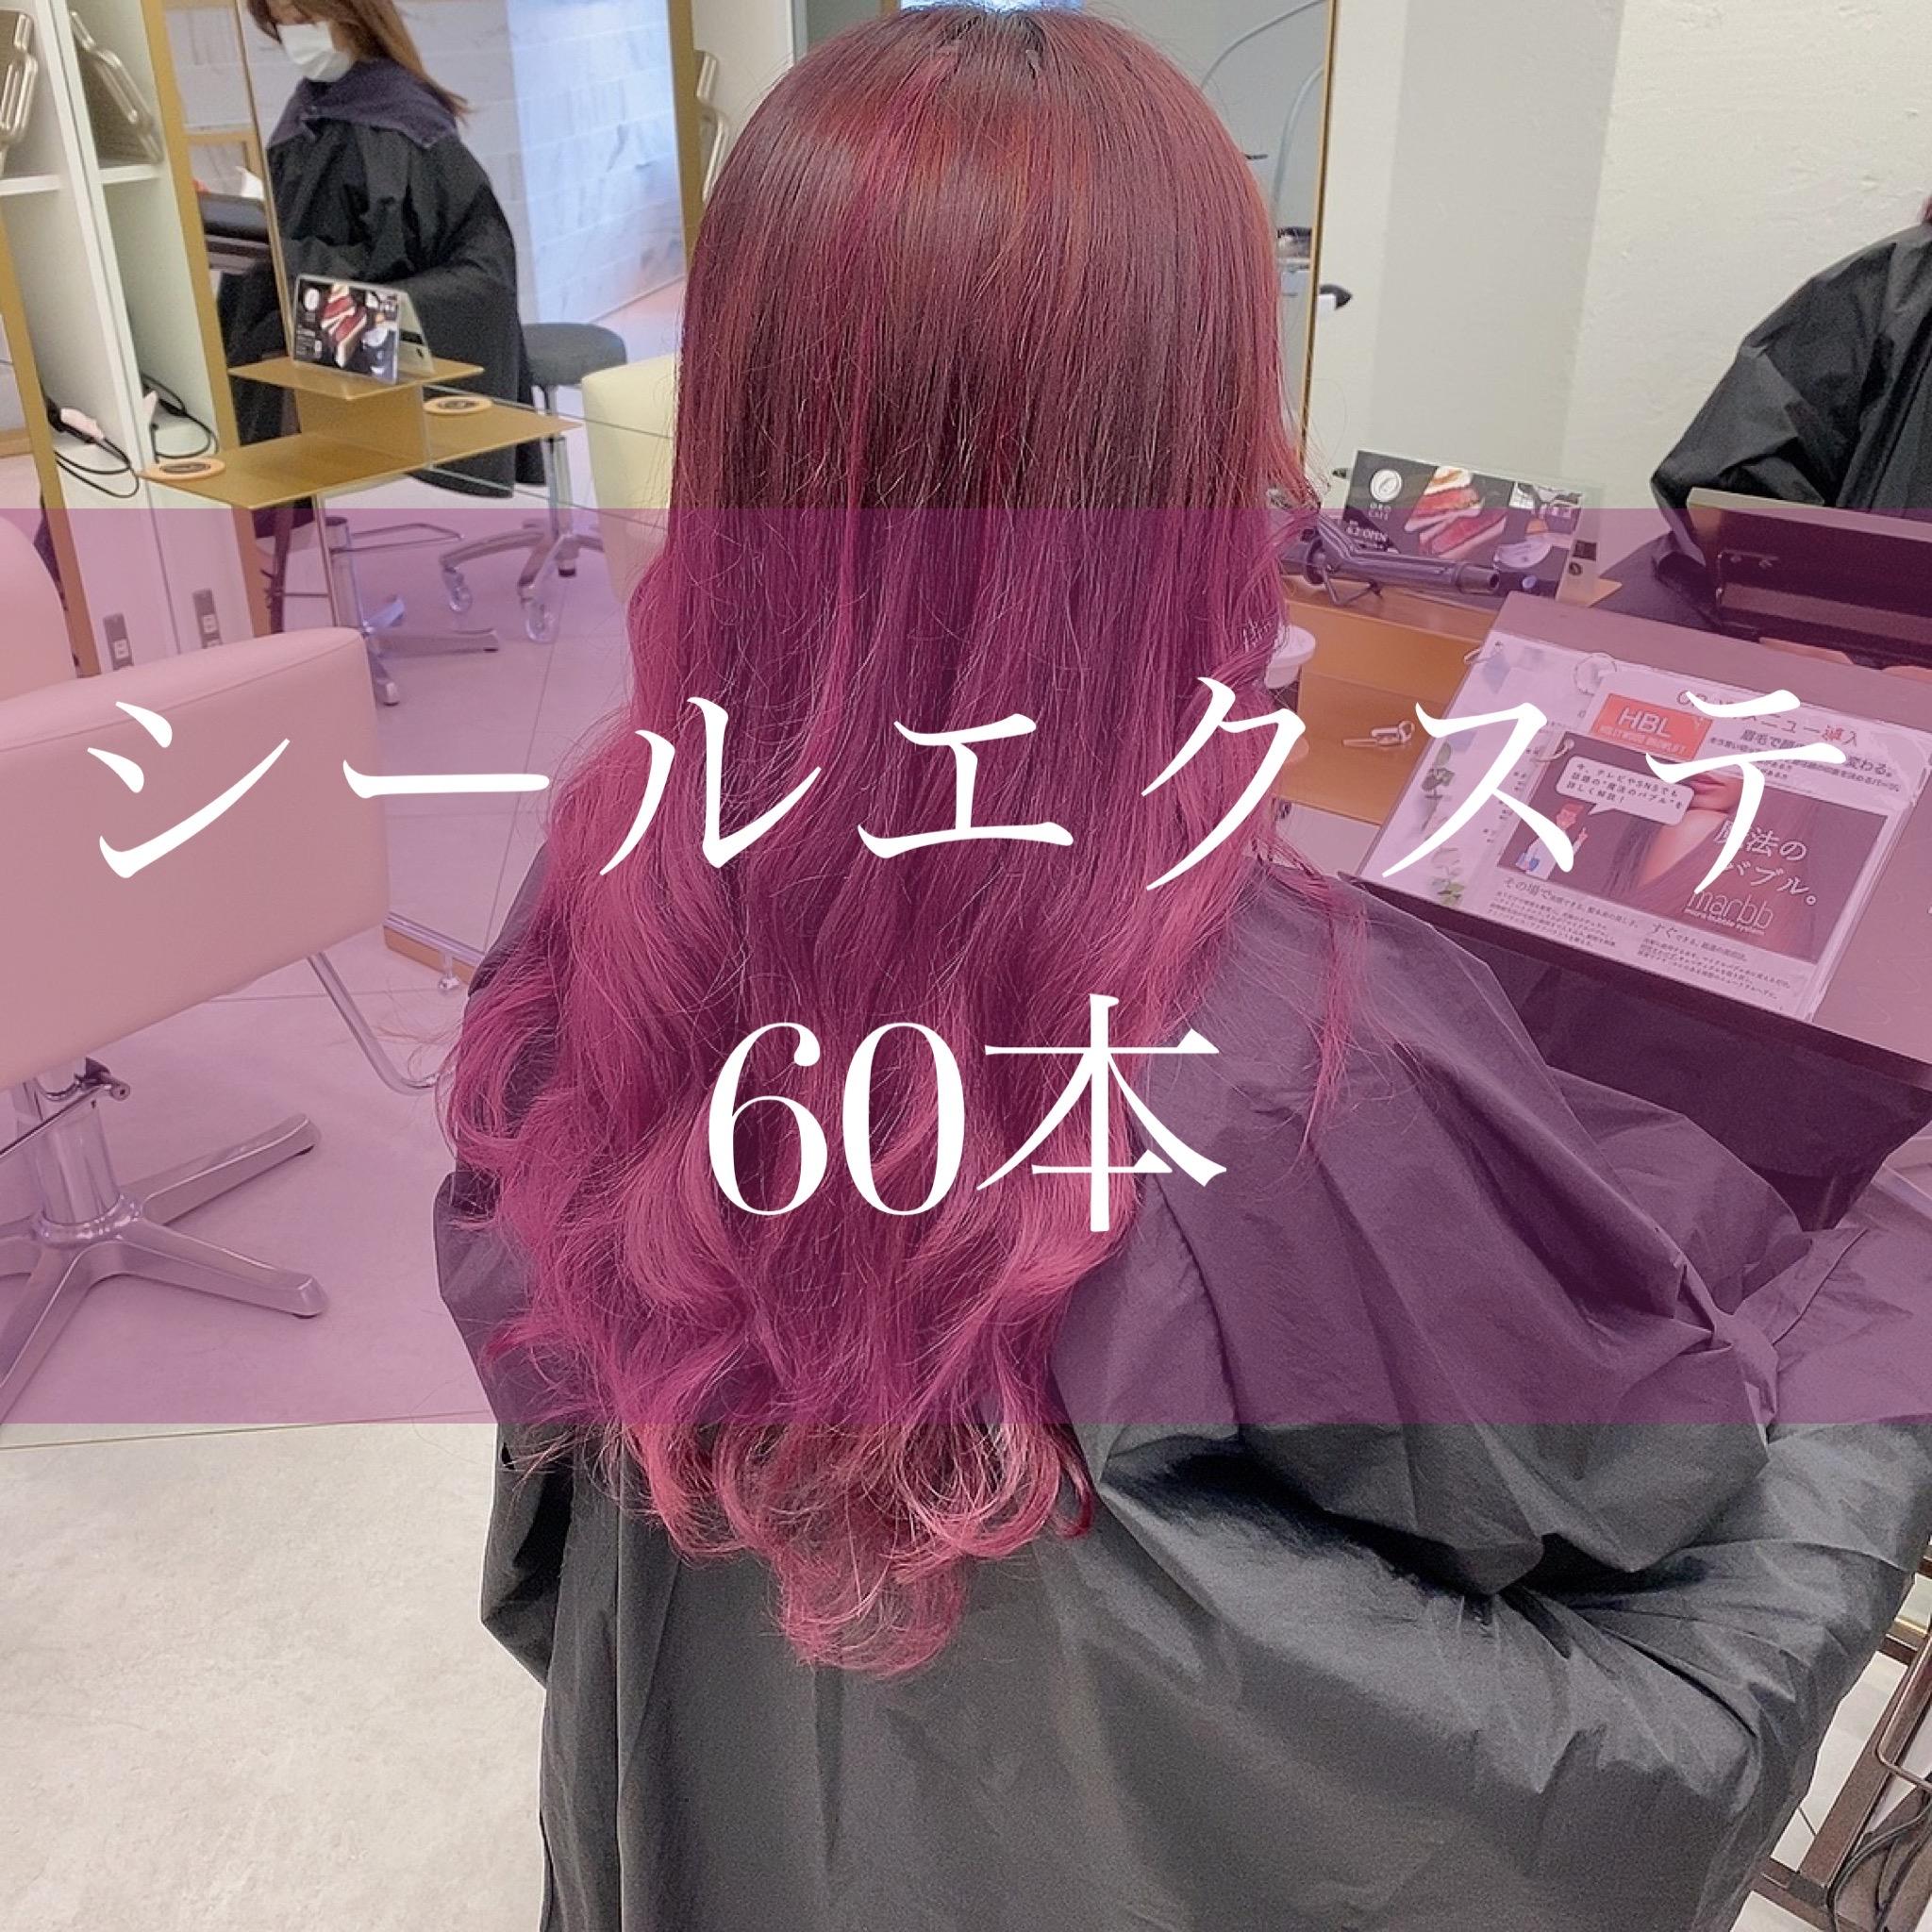 815715C1-481D-4F25-B215-E7FCEF129B67